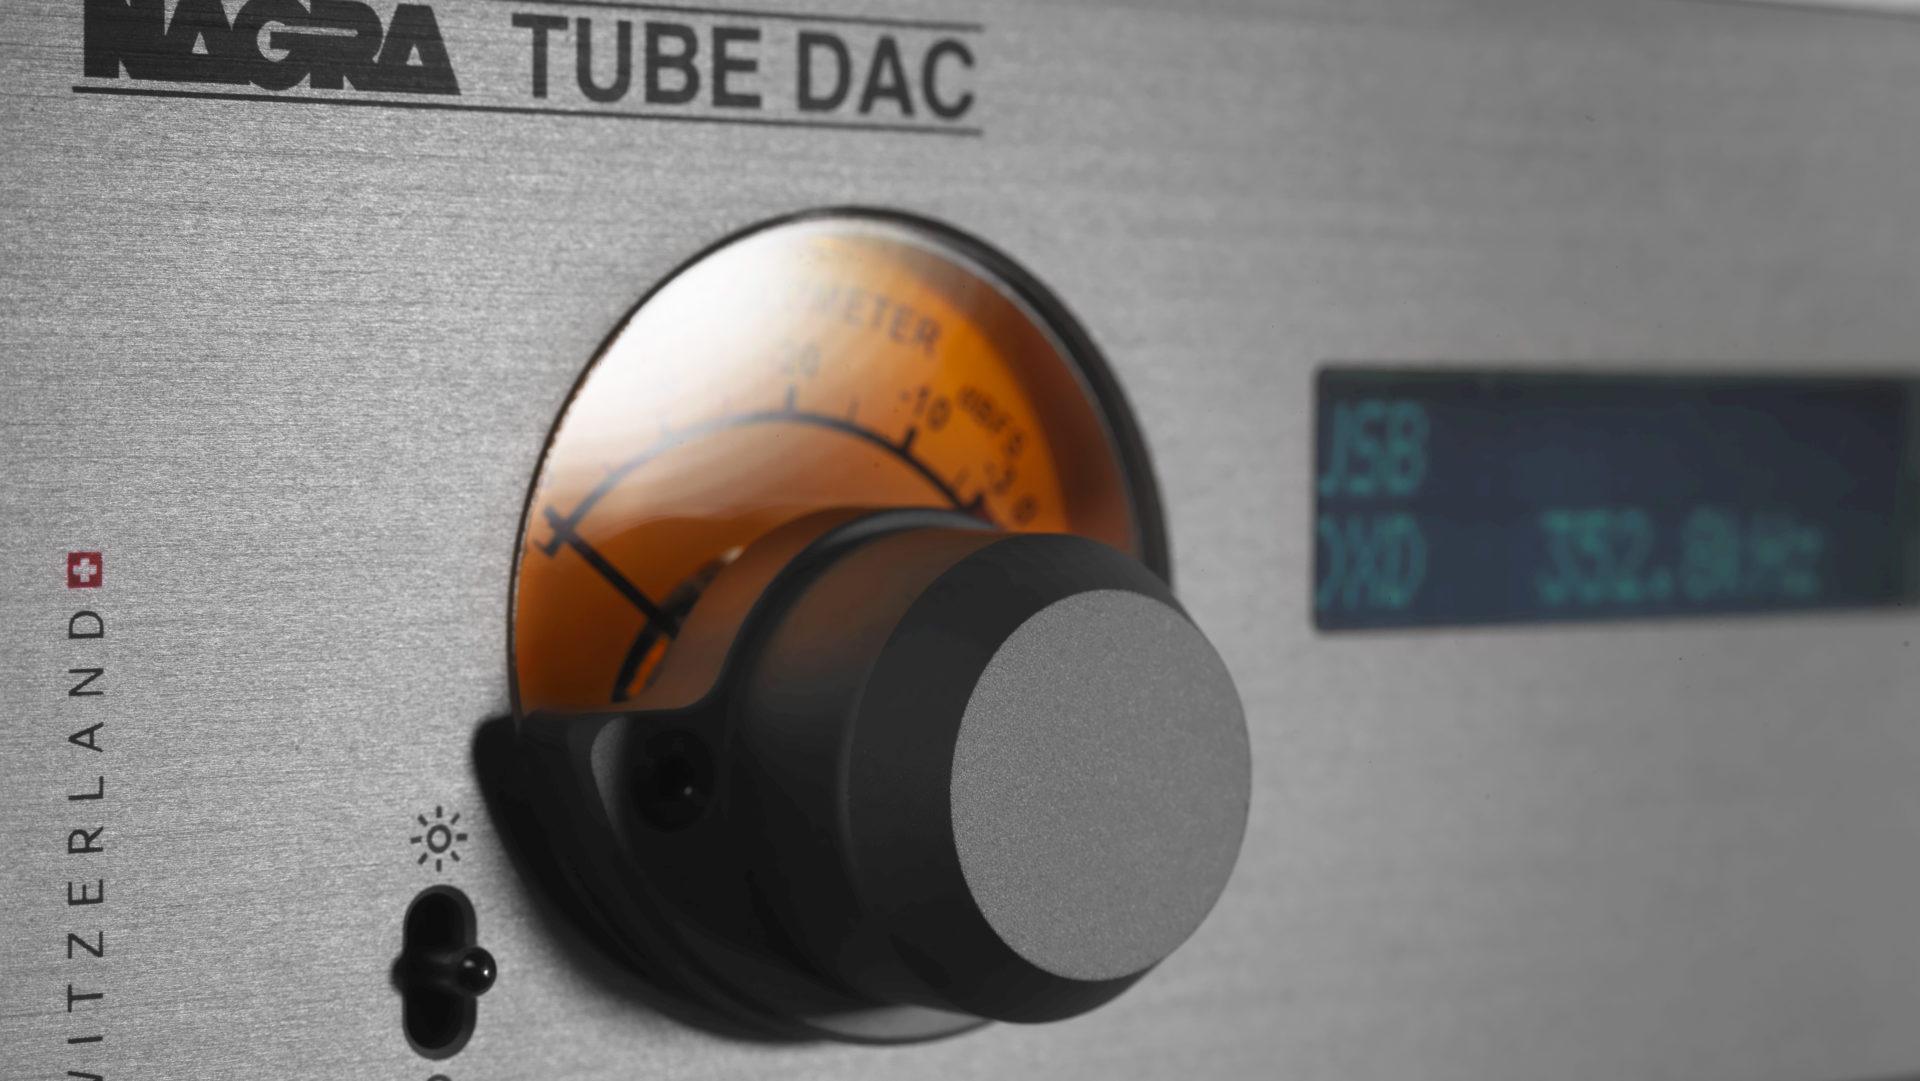 Nagra TUBE DAC digital to analog converter high end top best front modulometer